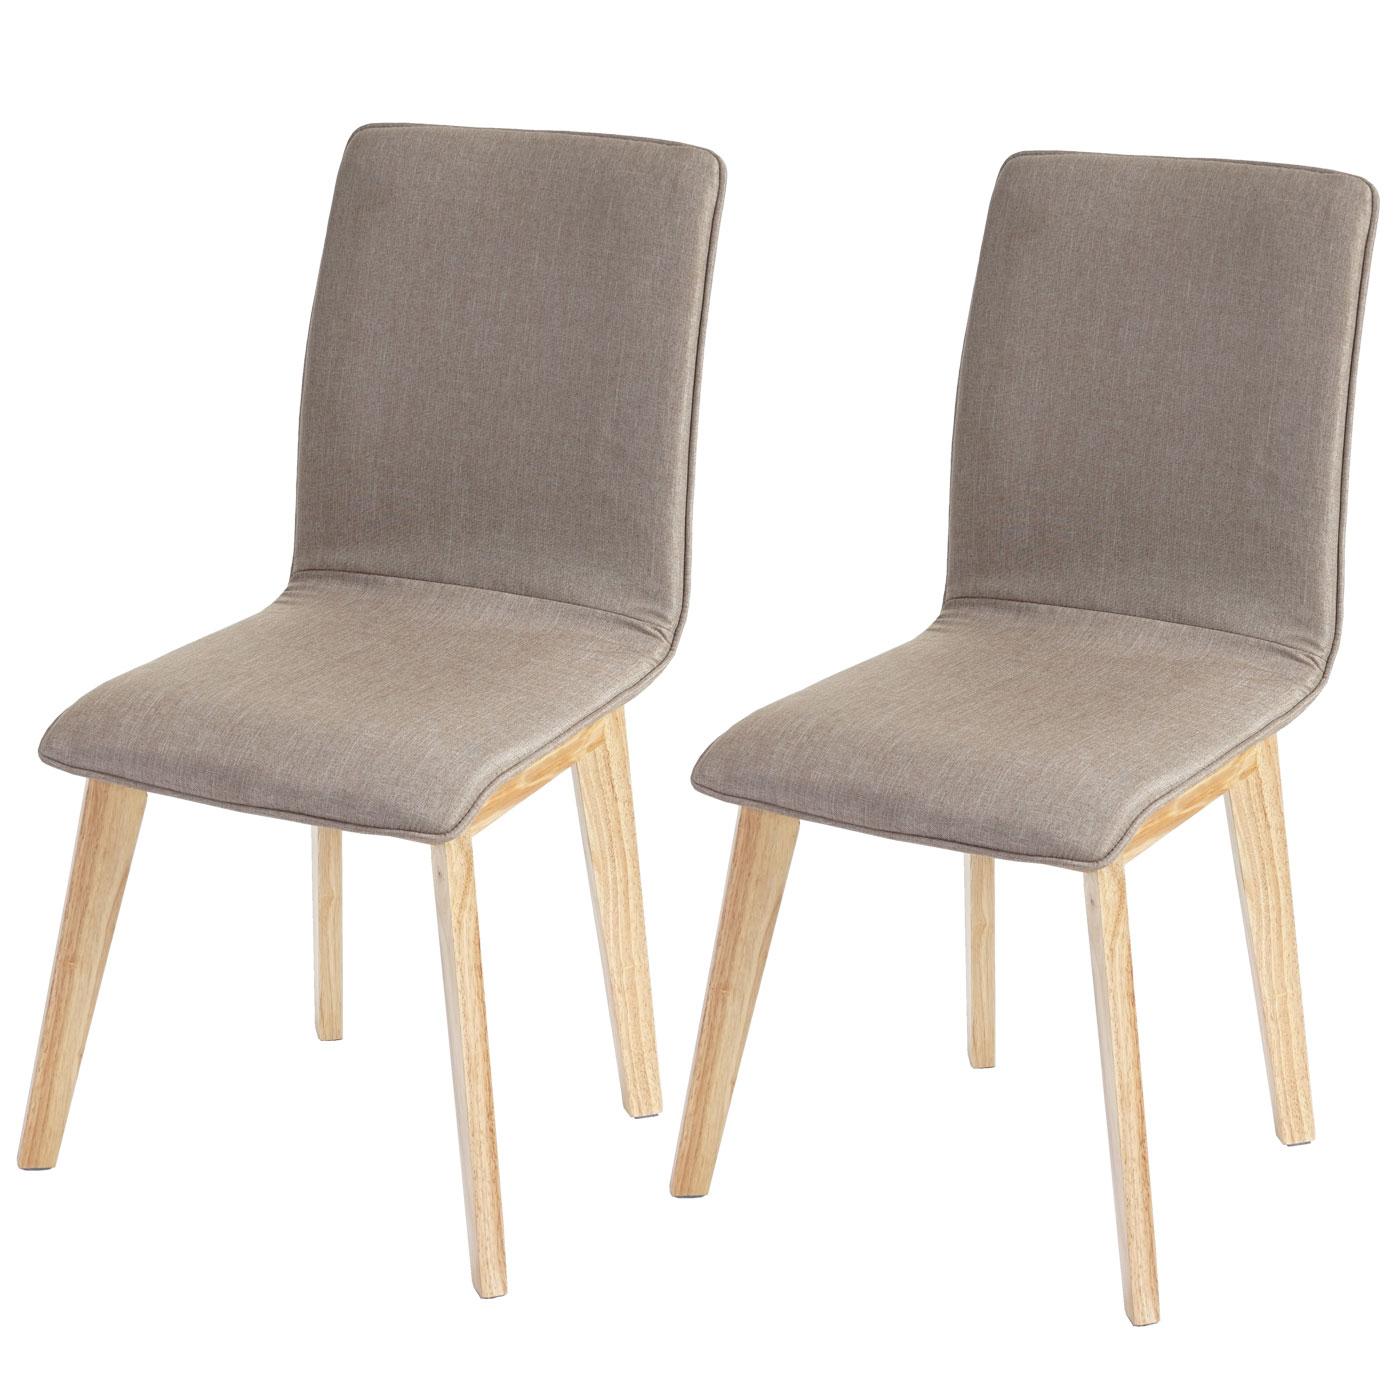 2x esszimmerstuhl zadar stuhl lehnstuhl retro 50er jahre for Stuhl design 50er